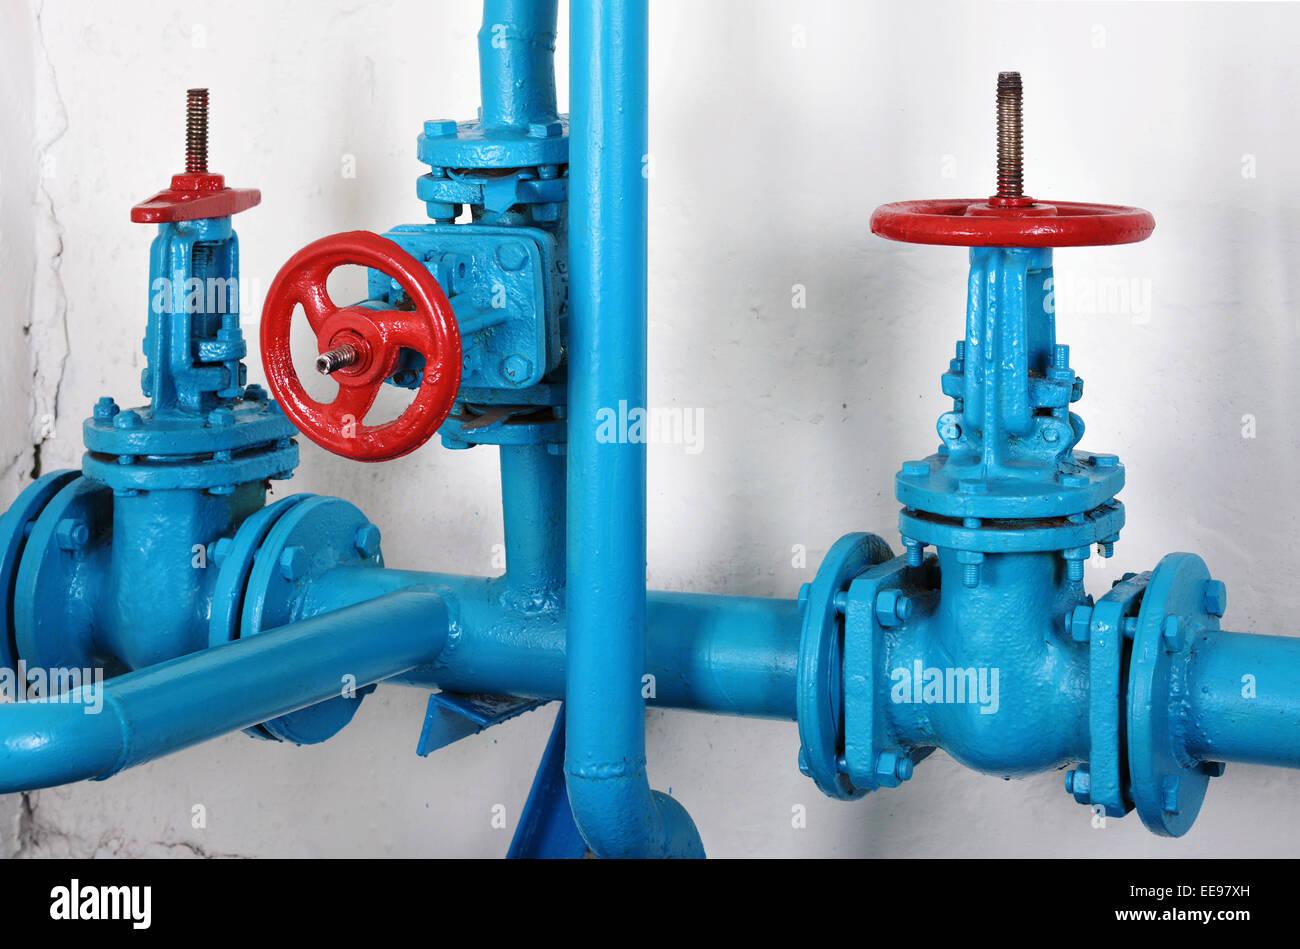 Valves Hot Water Heating Stock Photos & Valves Hot Water Heating ...